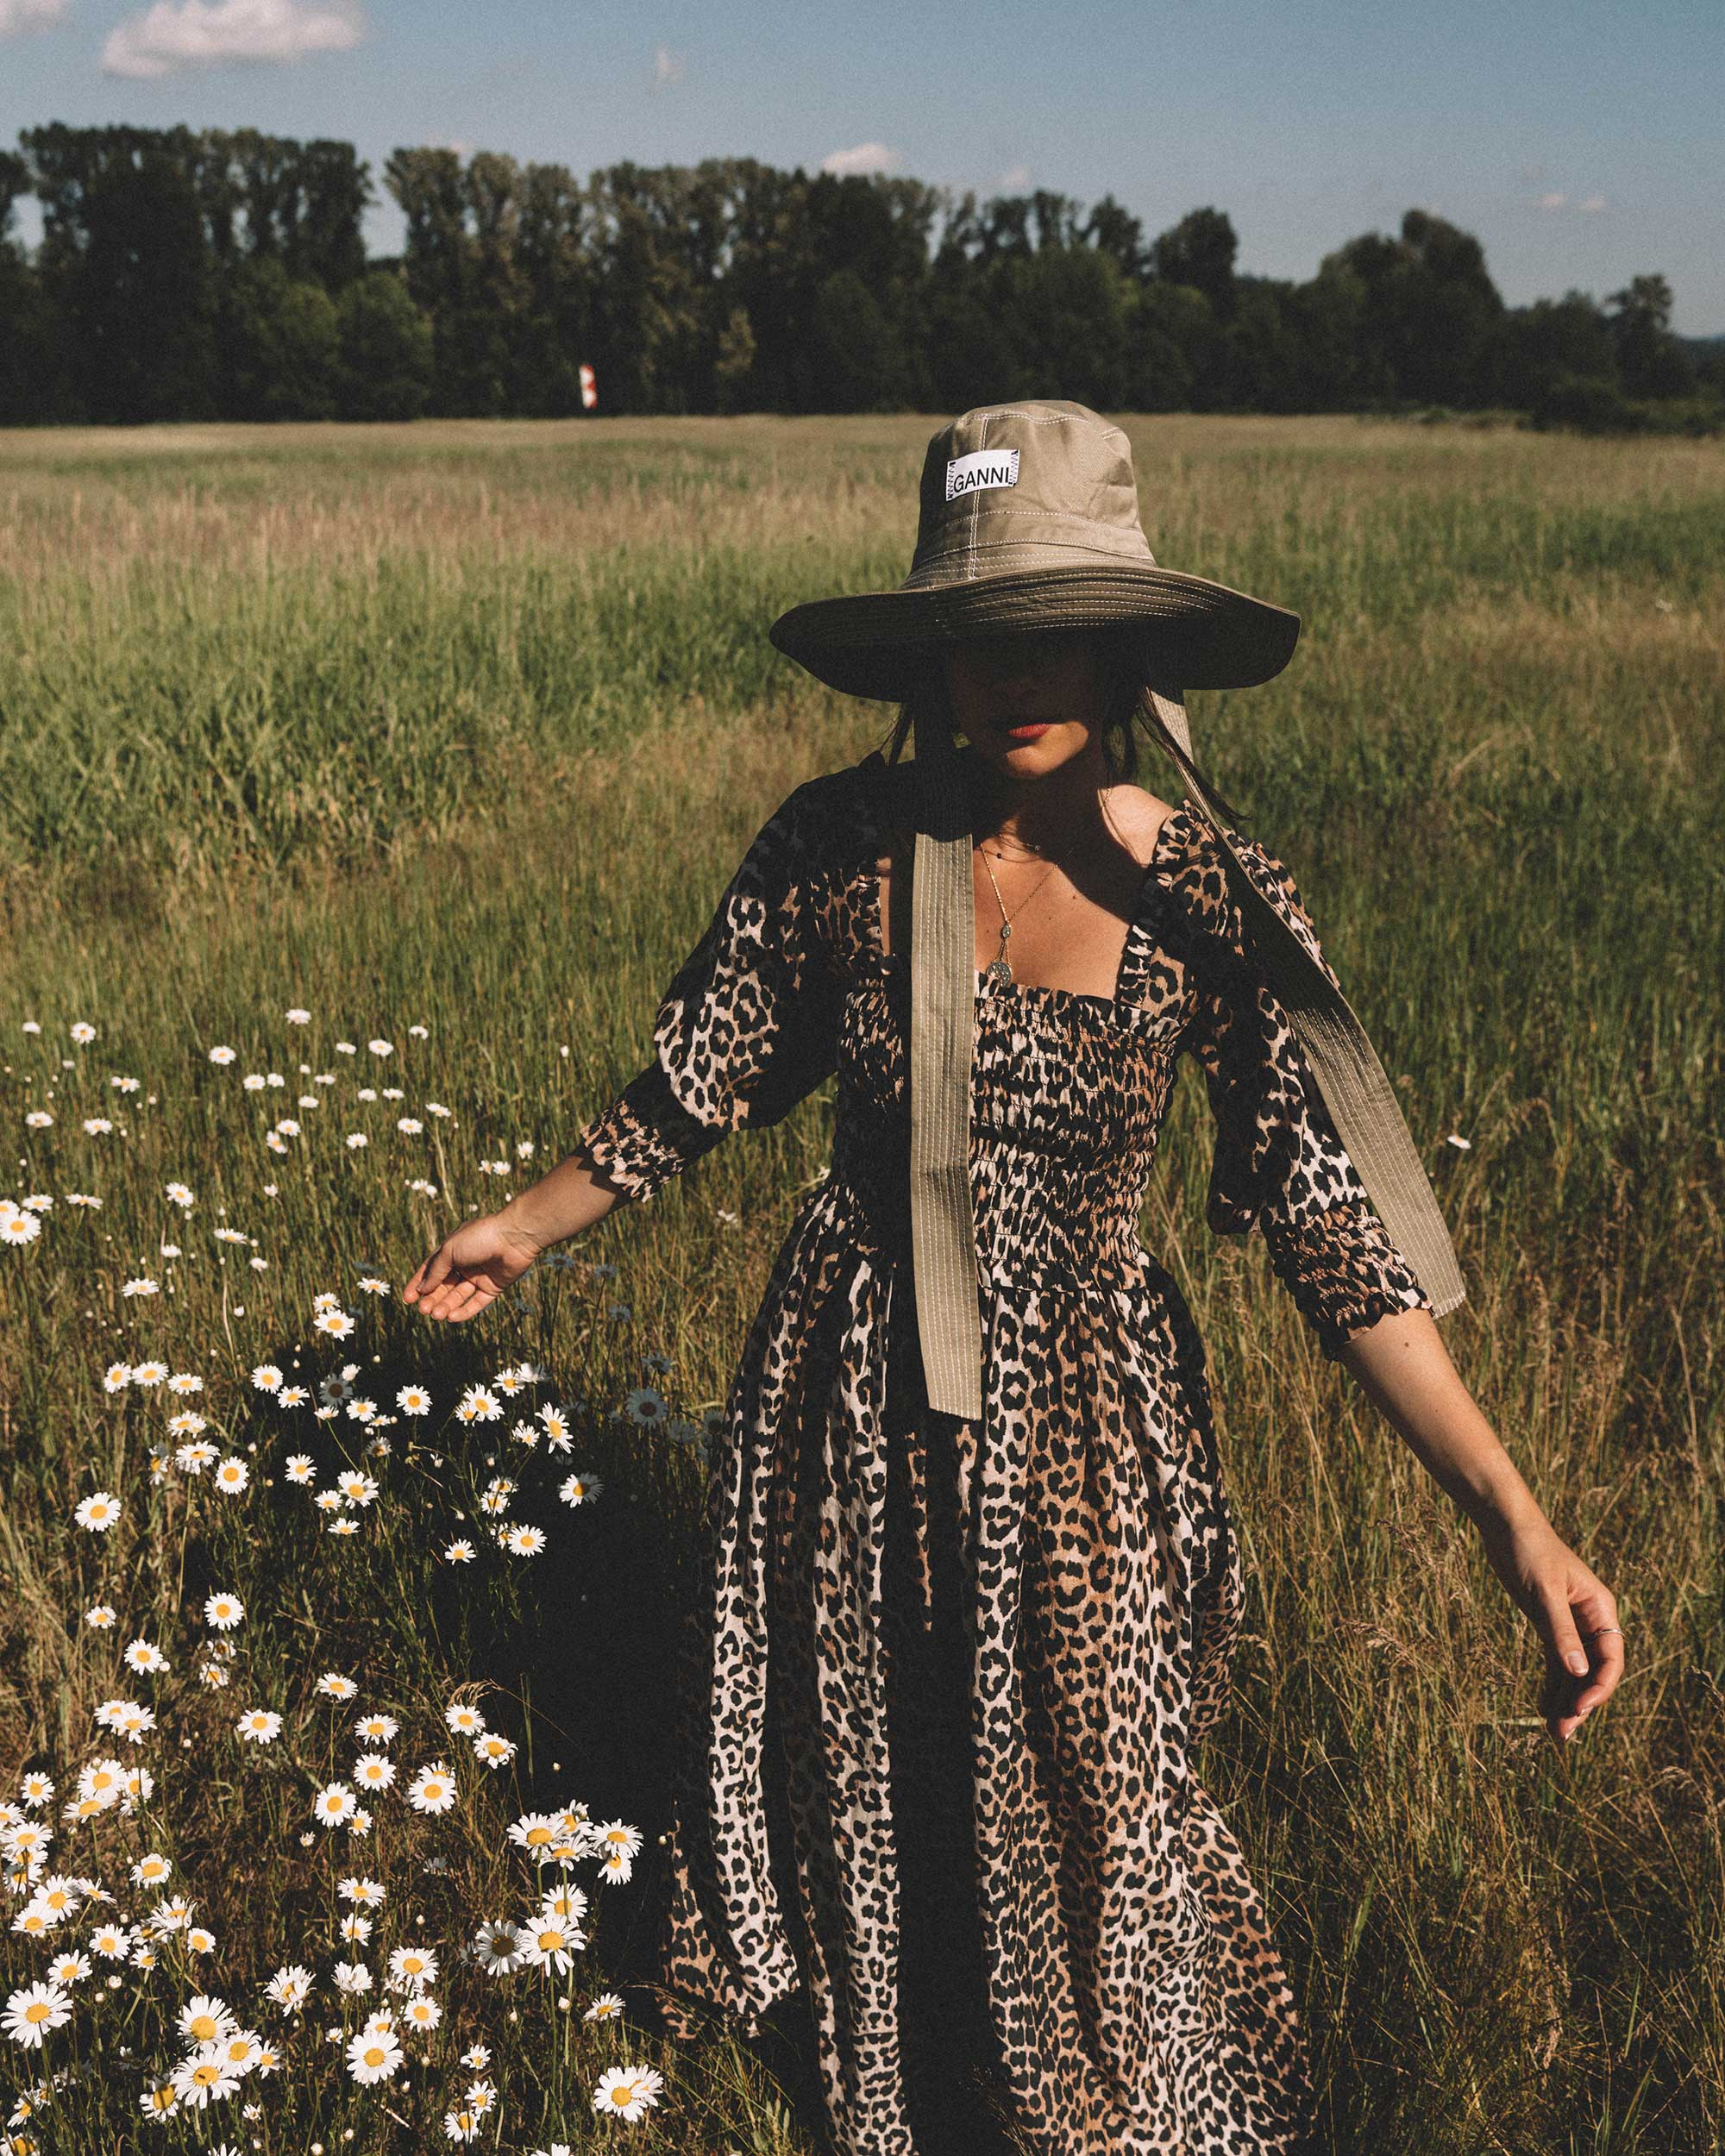 Sarah Butler of Sarah Styles wears GANNI Leopard-print Maxi Dress and GANNI wide brim hat in Seattle, Washington Feild | @sarahchristine --9.jpg